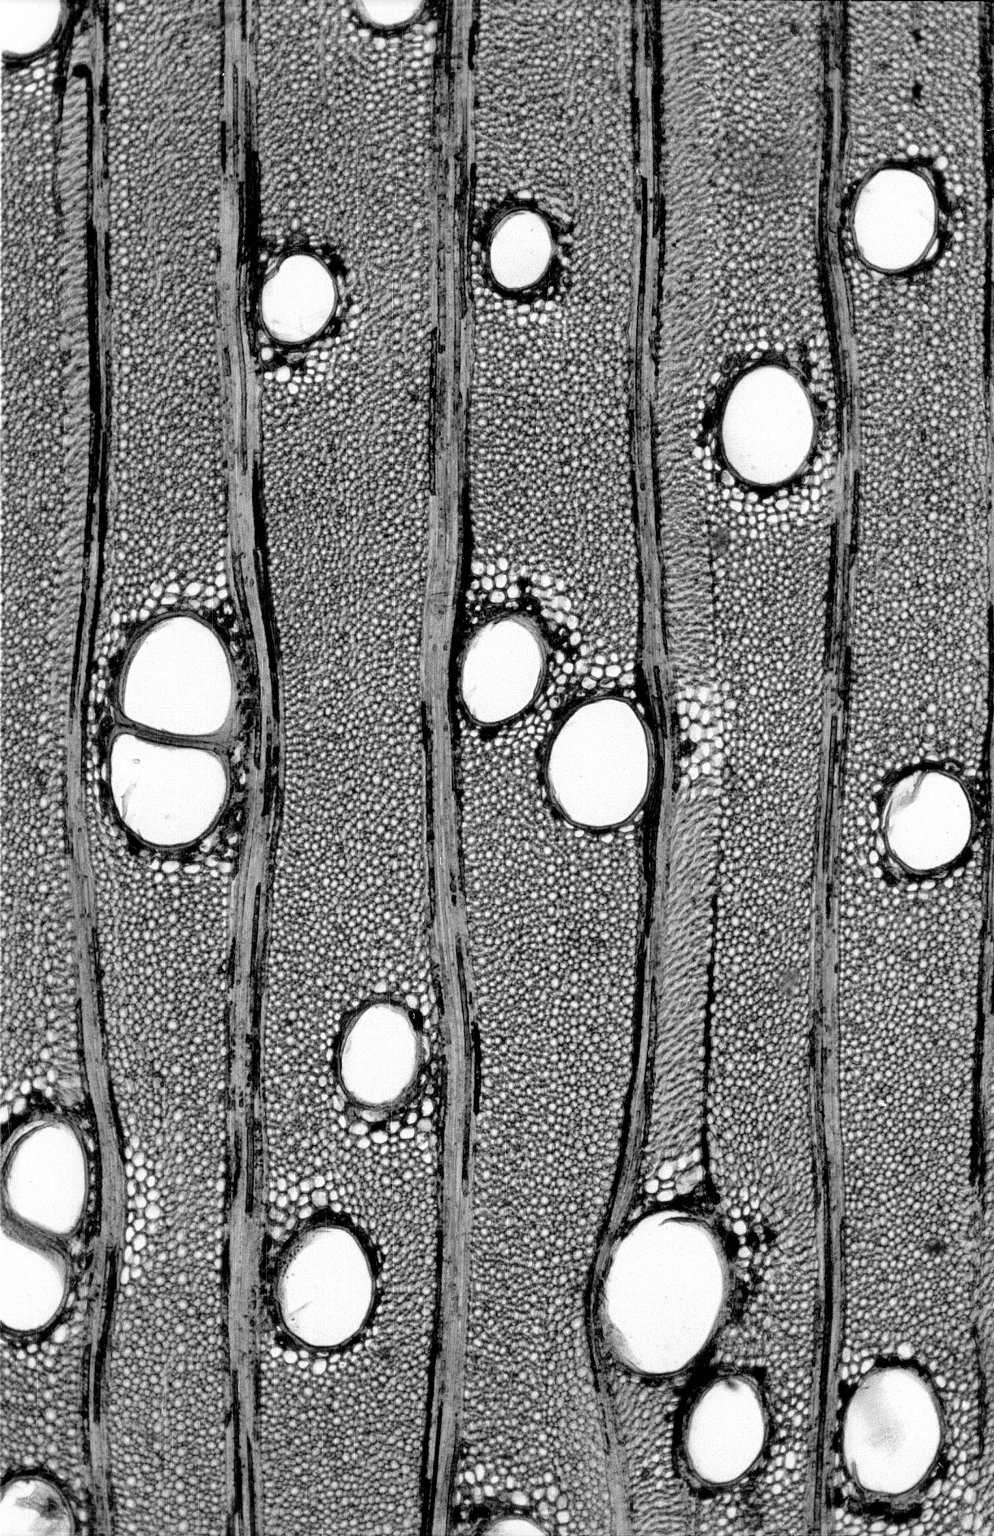 LEGUMINOSAE CAESALPINIOIDEAE Mimosoid Clade Vachellia nilotica